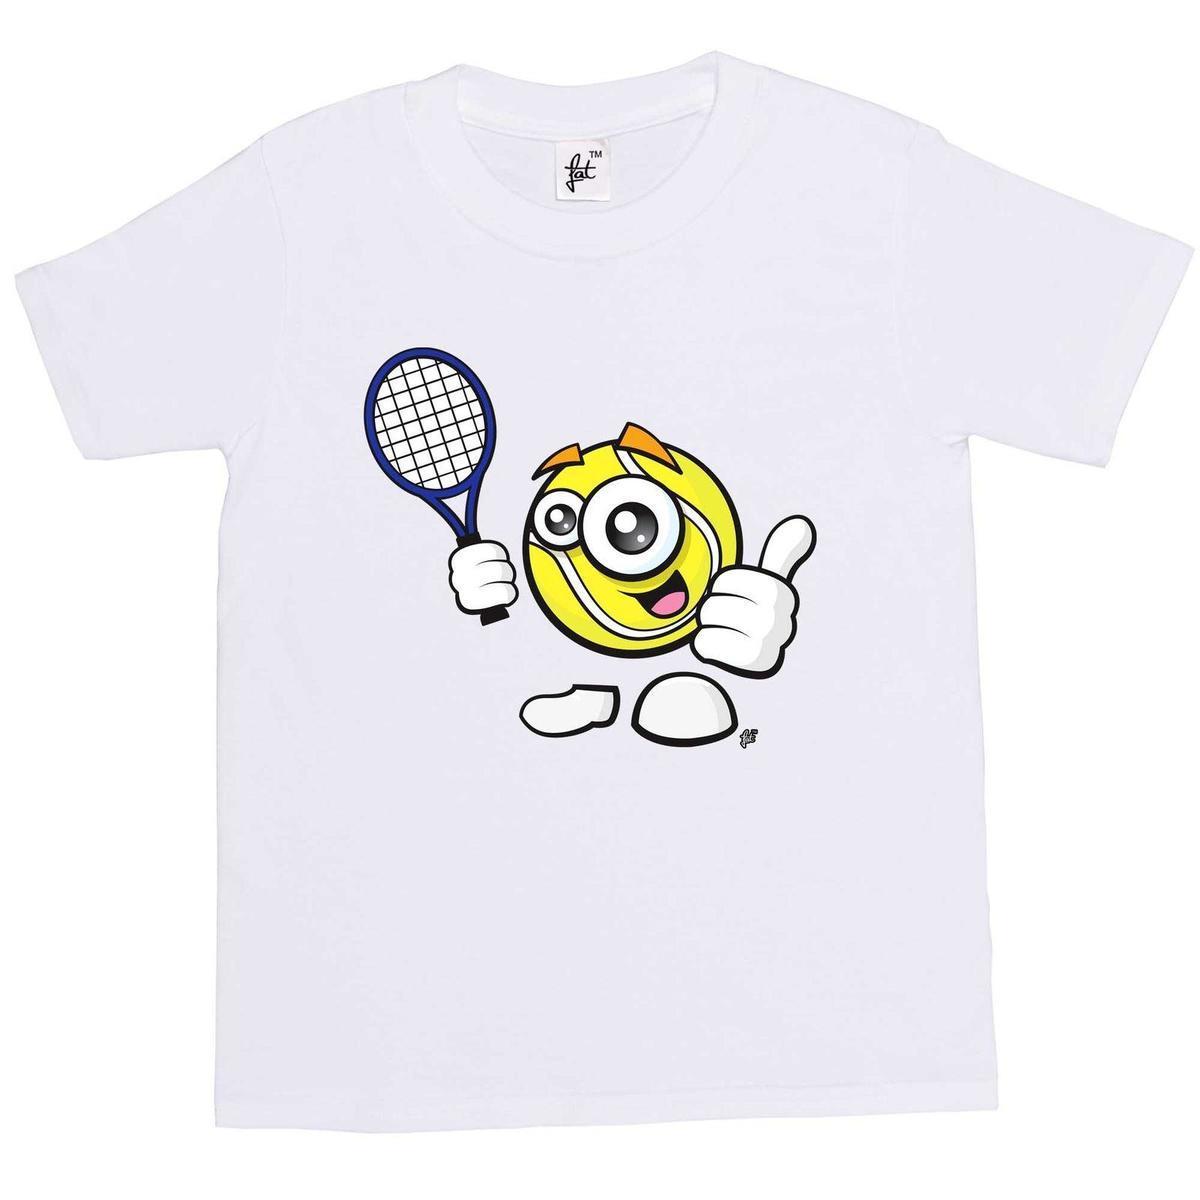 2aa804f84f6 Sporticon Happy Tennis Ball Ready With Racket Kids Boys T Shirt Fun T Shirt Buy  Online T Shirts From Linnan08